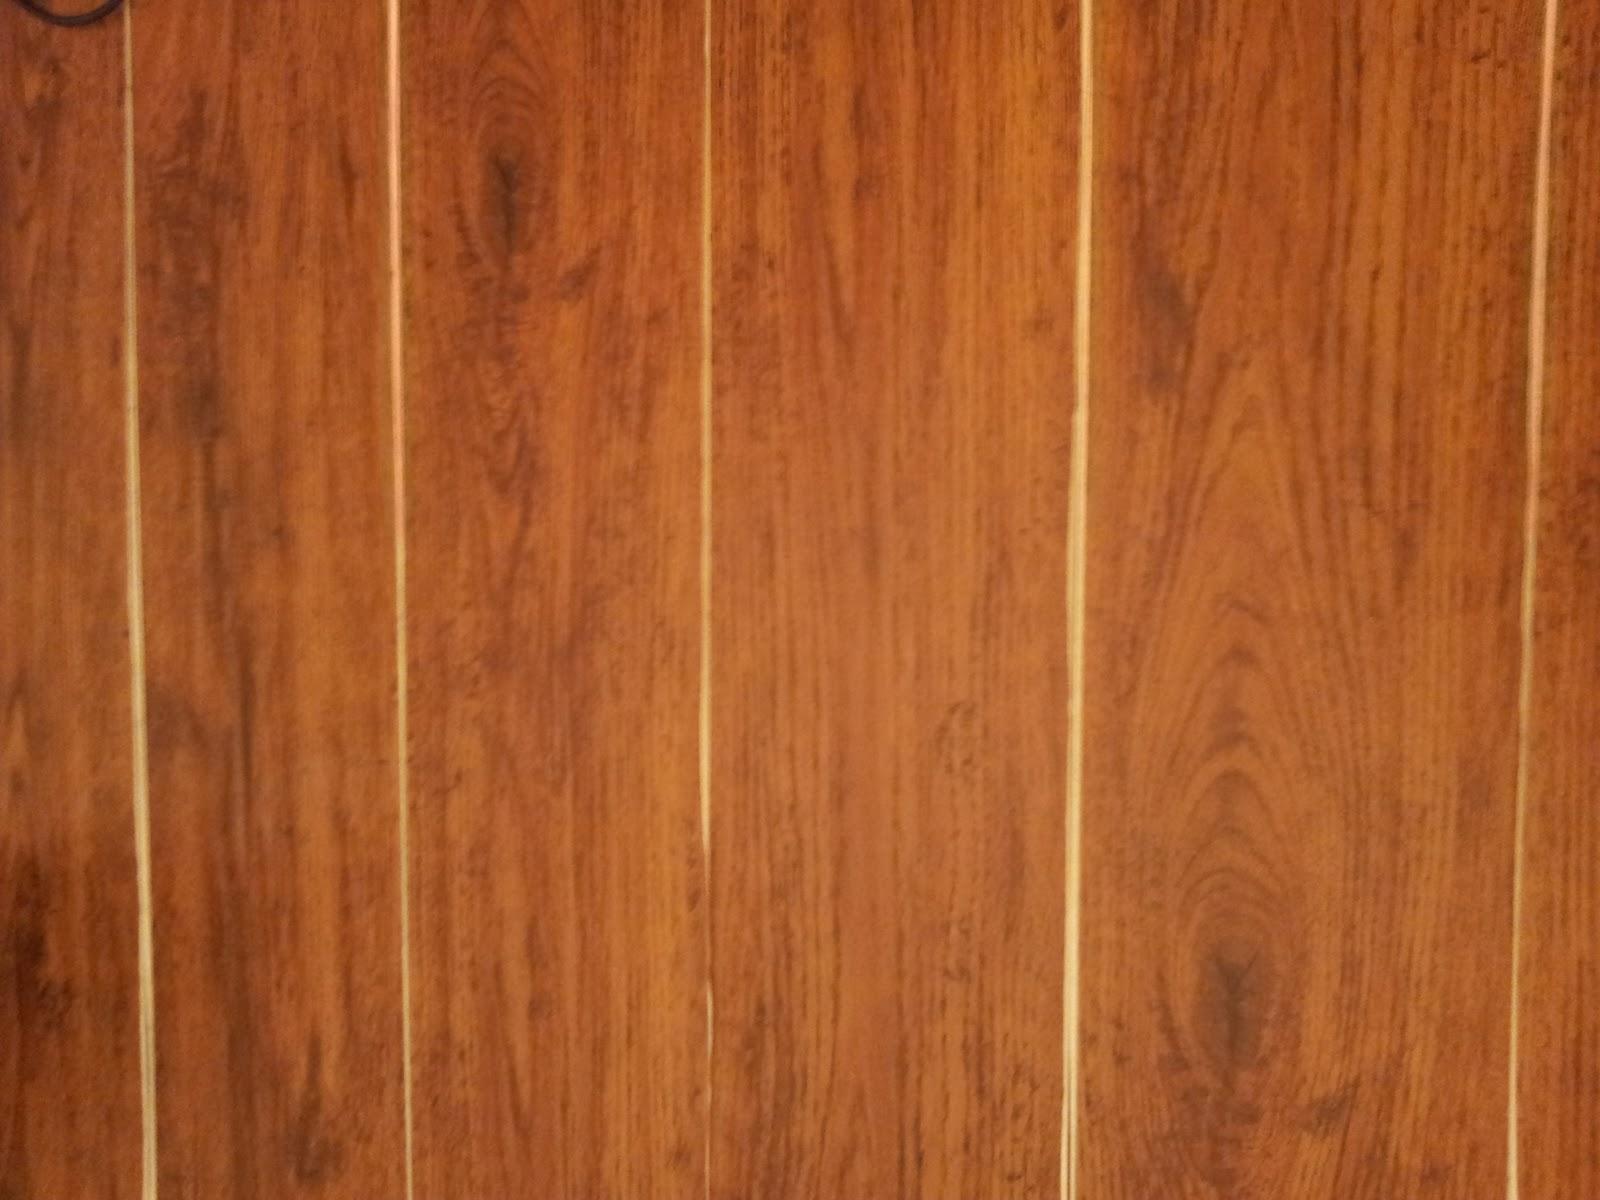 Vinyl Laminate Flooring As Wall Sign